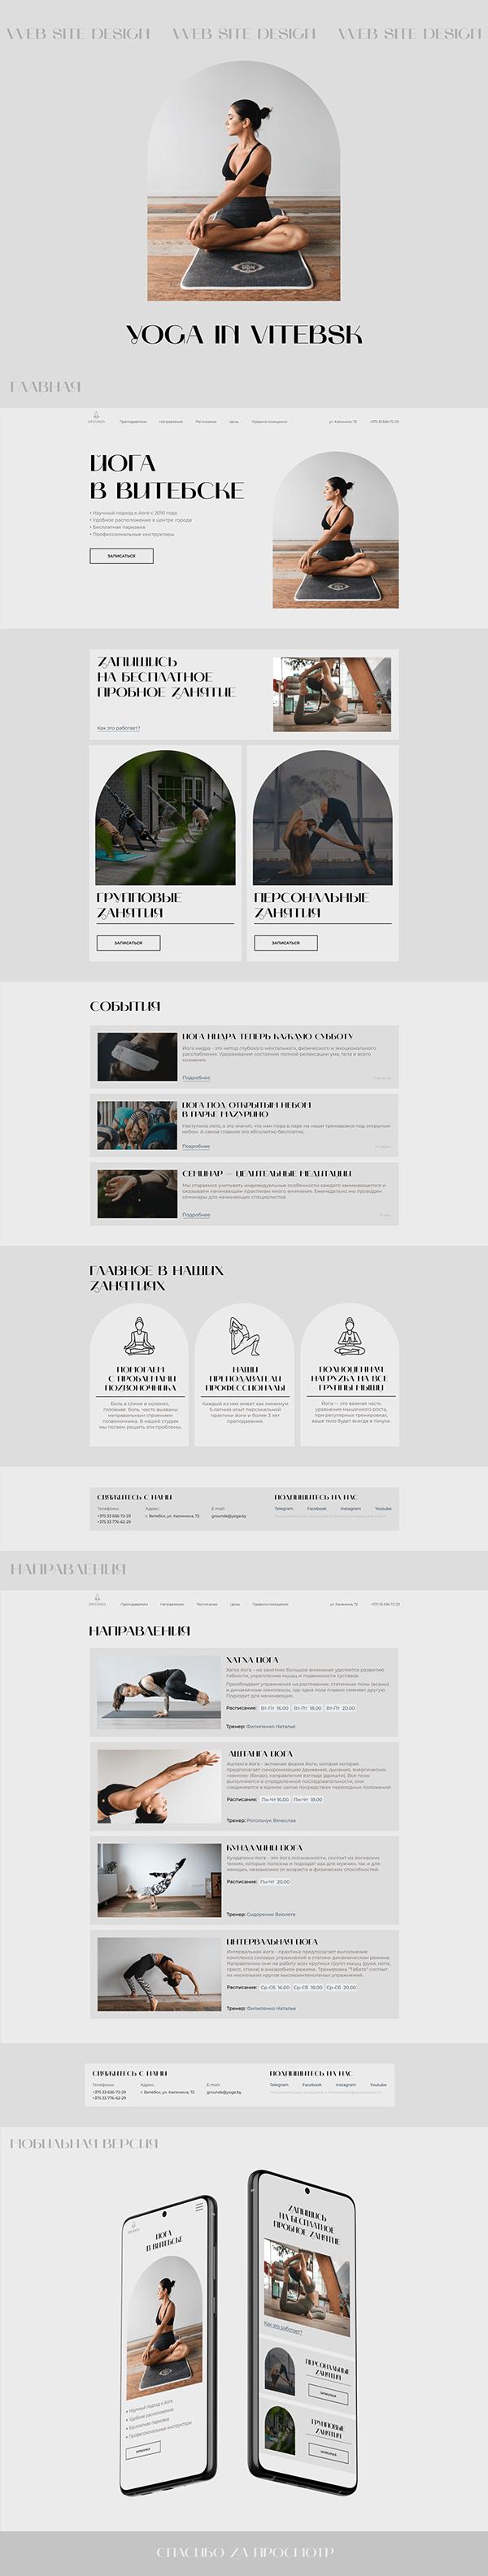 Web site for yoga studio